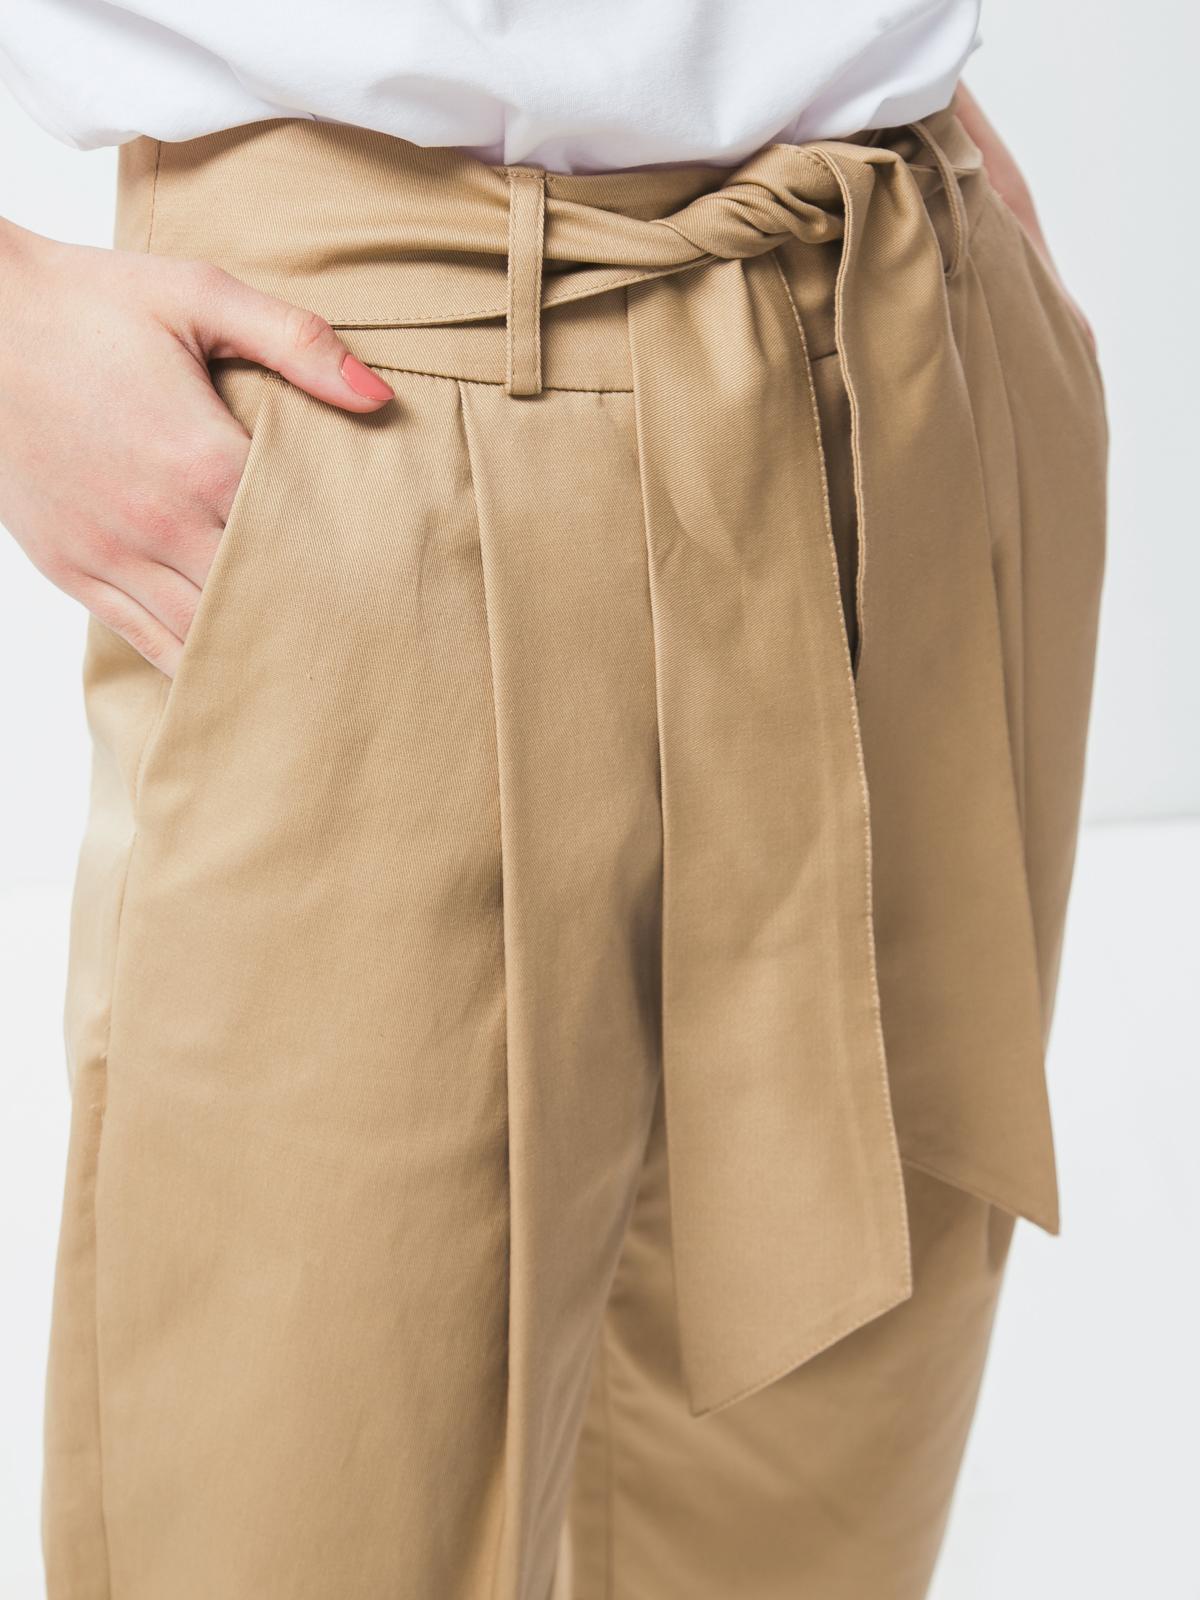 36a6bc77c05 Naiste püksid trussardi jeans | Newmood